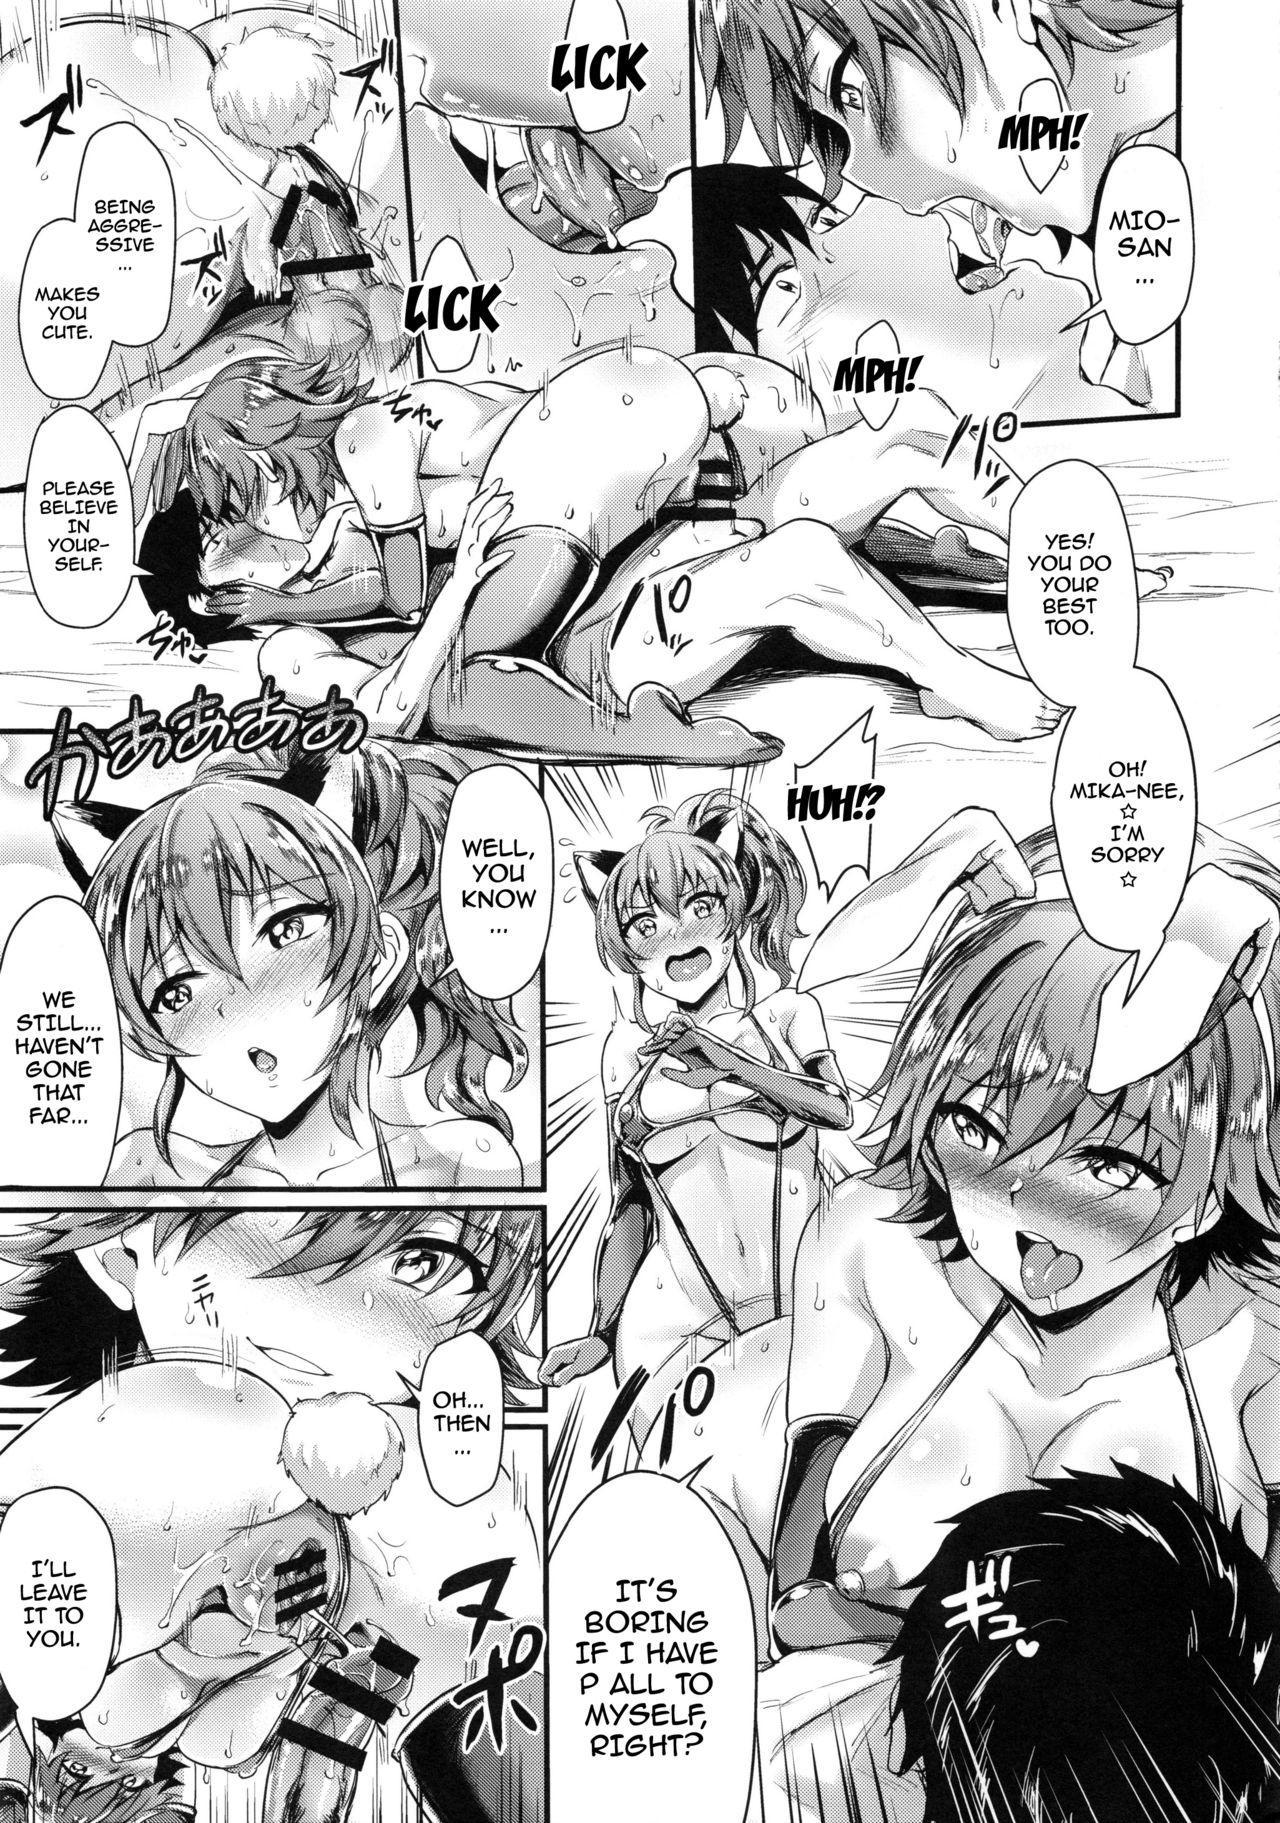 (C92) [BRIO (Puyocha)] Mika-nee no Tanryoku Shidou - Mika's Guide to Self-Confidence (THE IDOLM@STER CINDERELLA GIRLS) [English] {doujins.com} 15